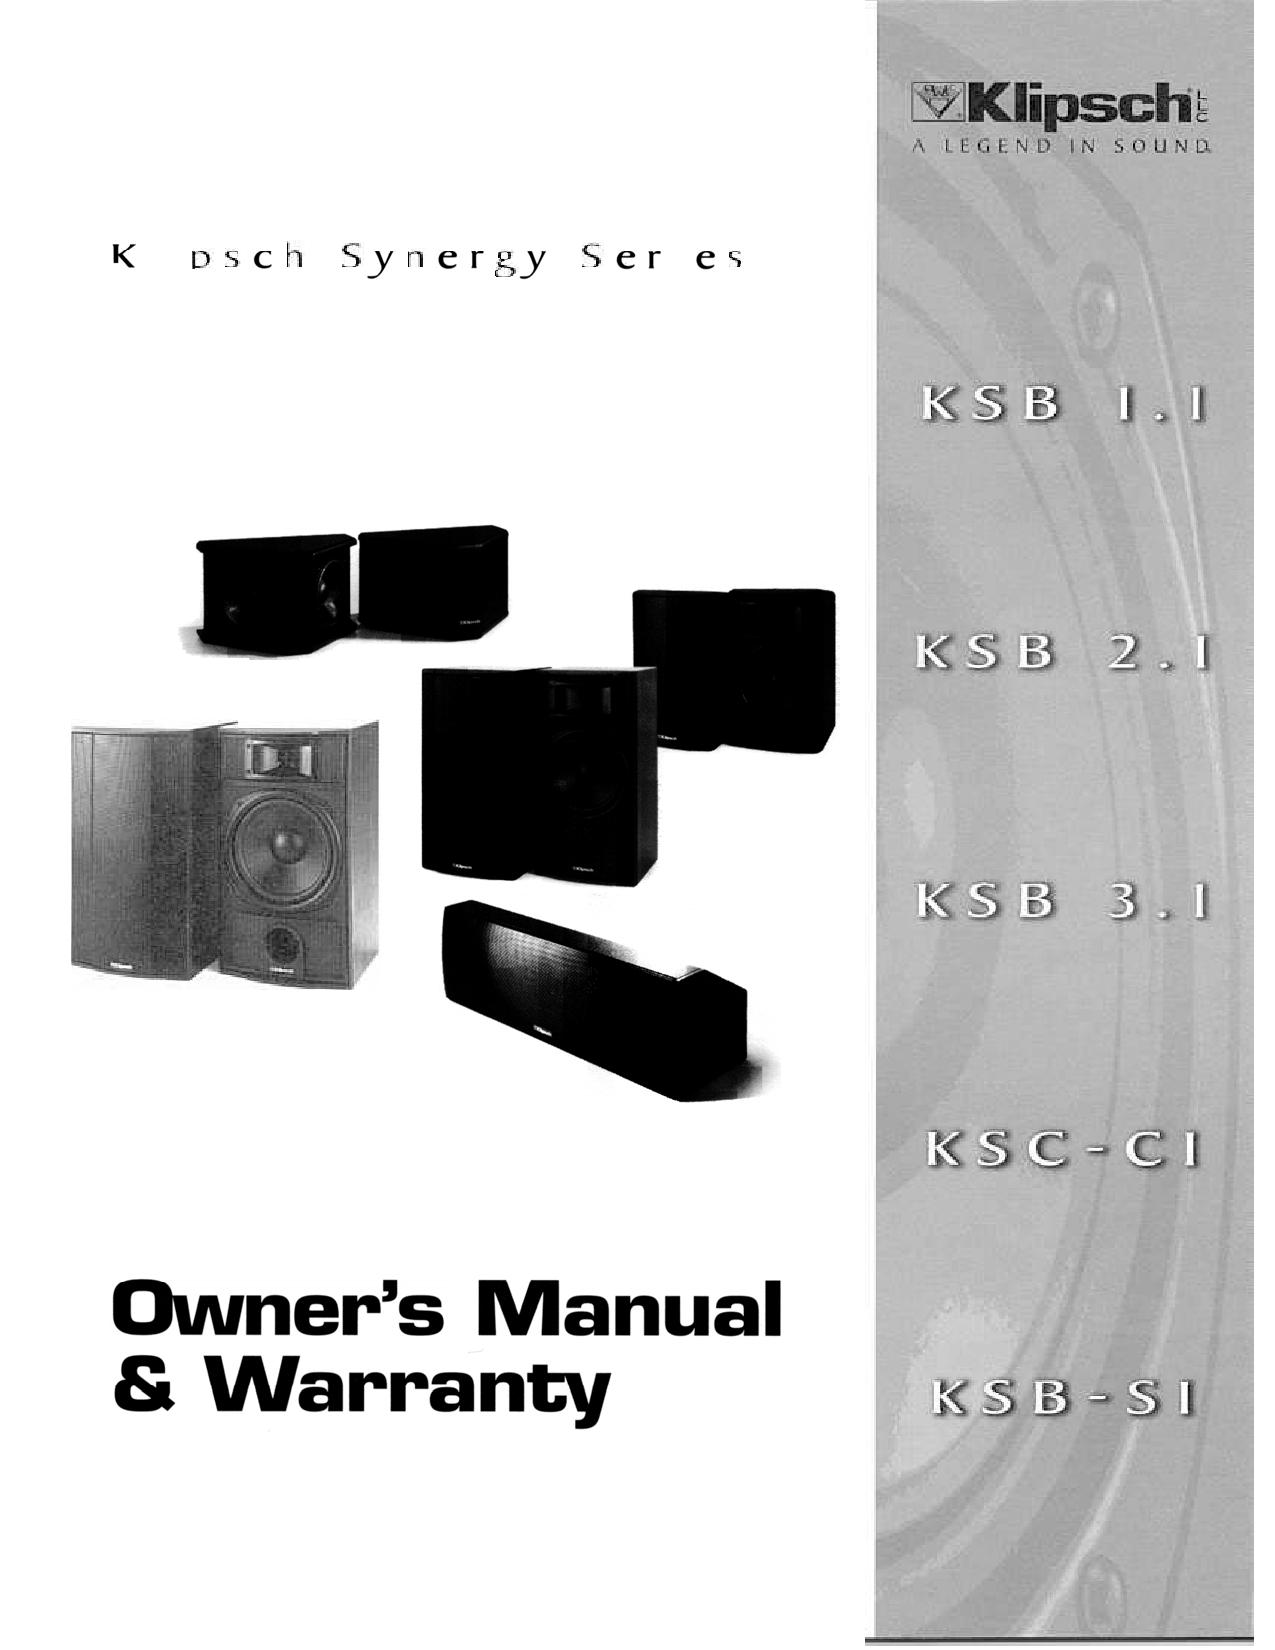 Klipsch KSB2 1, KSB-S1, KSB 3 1, Synergy KSB 1 1 User Manual